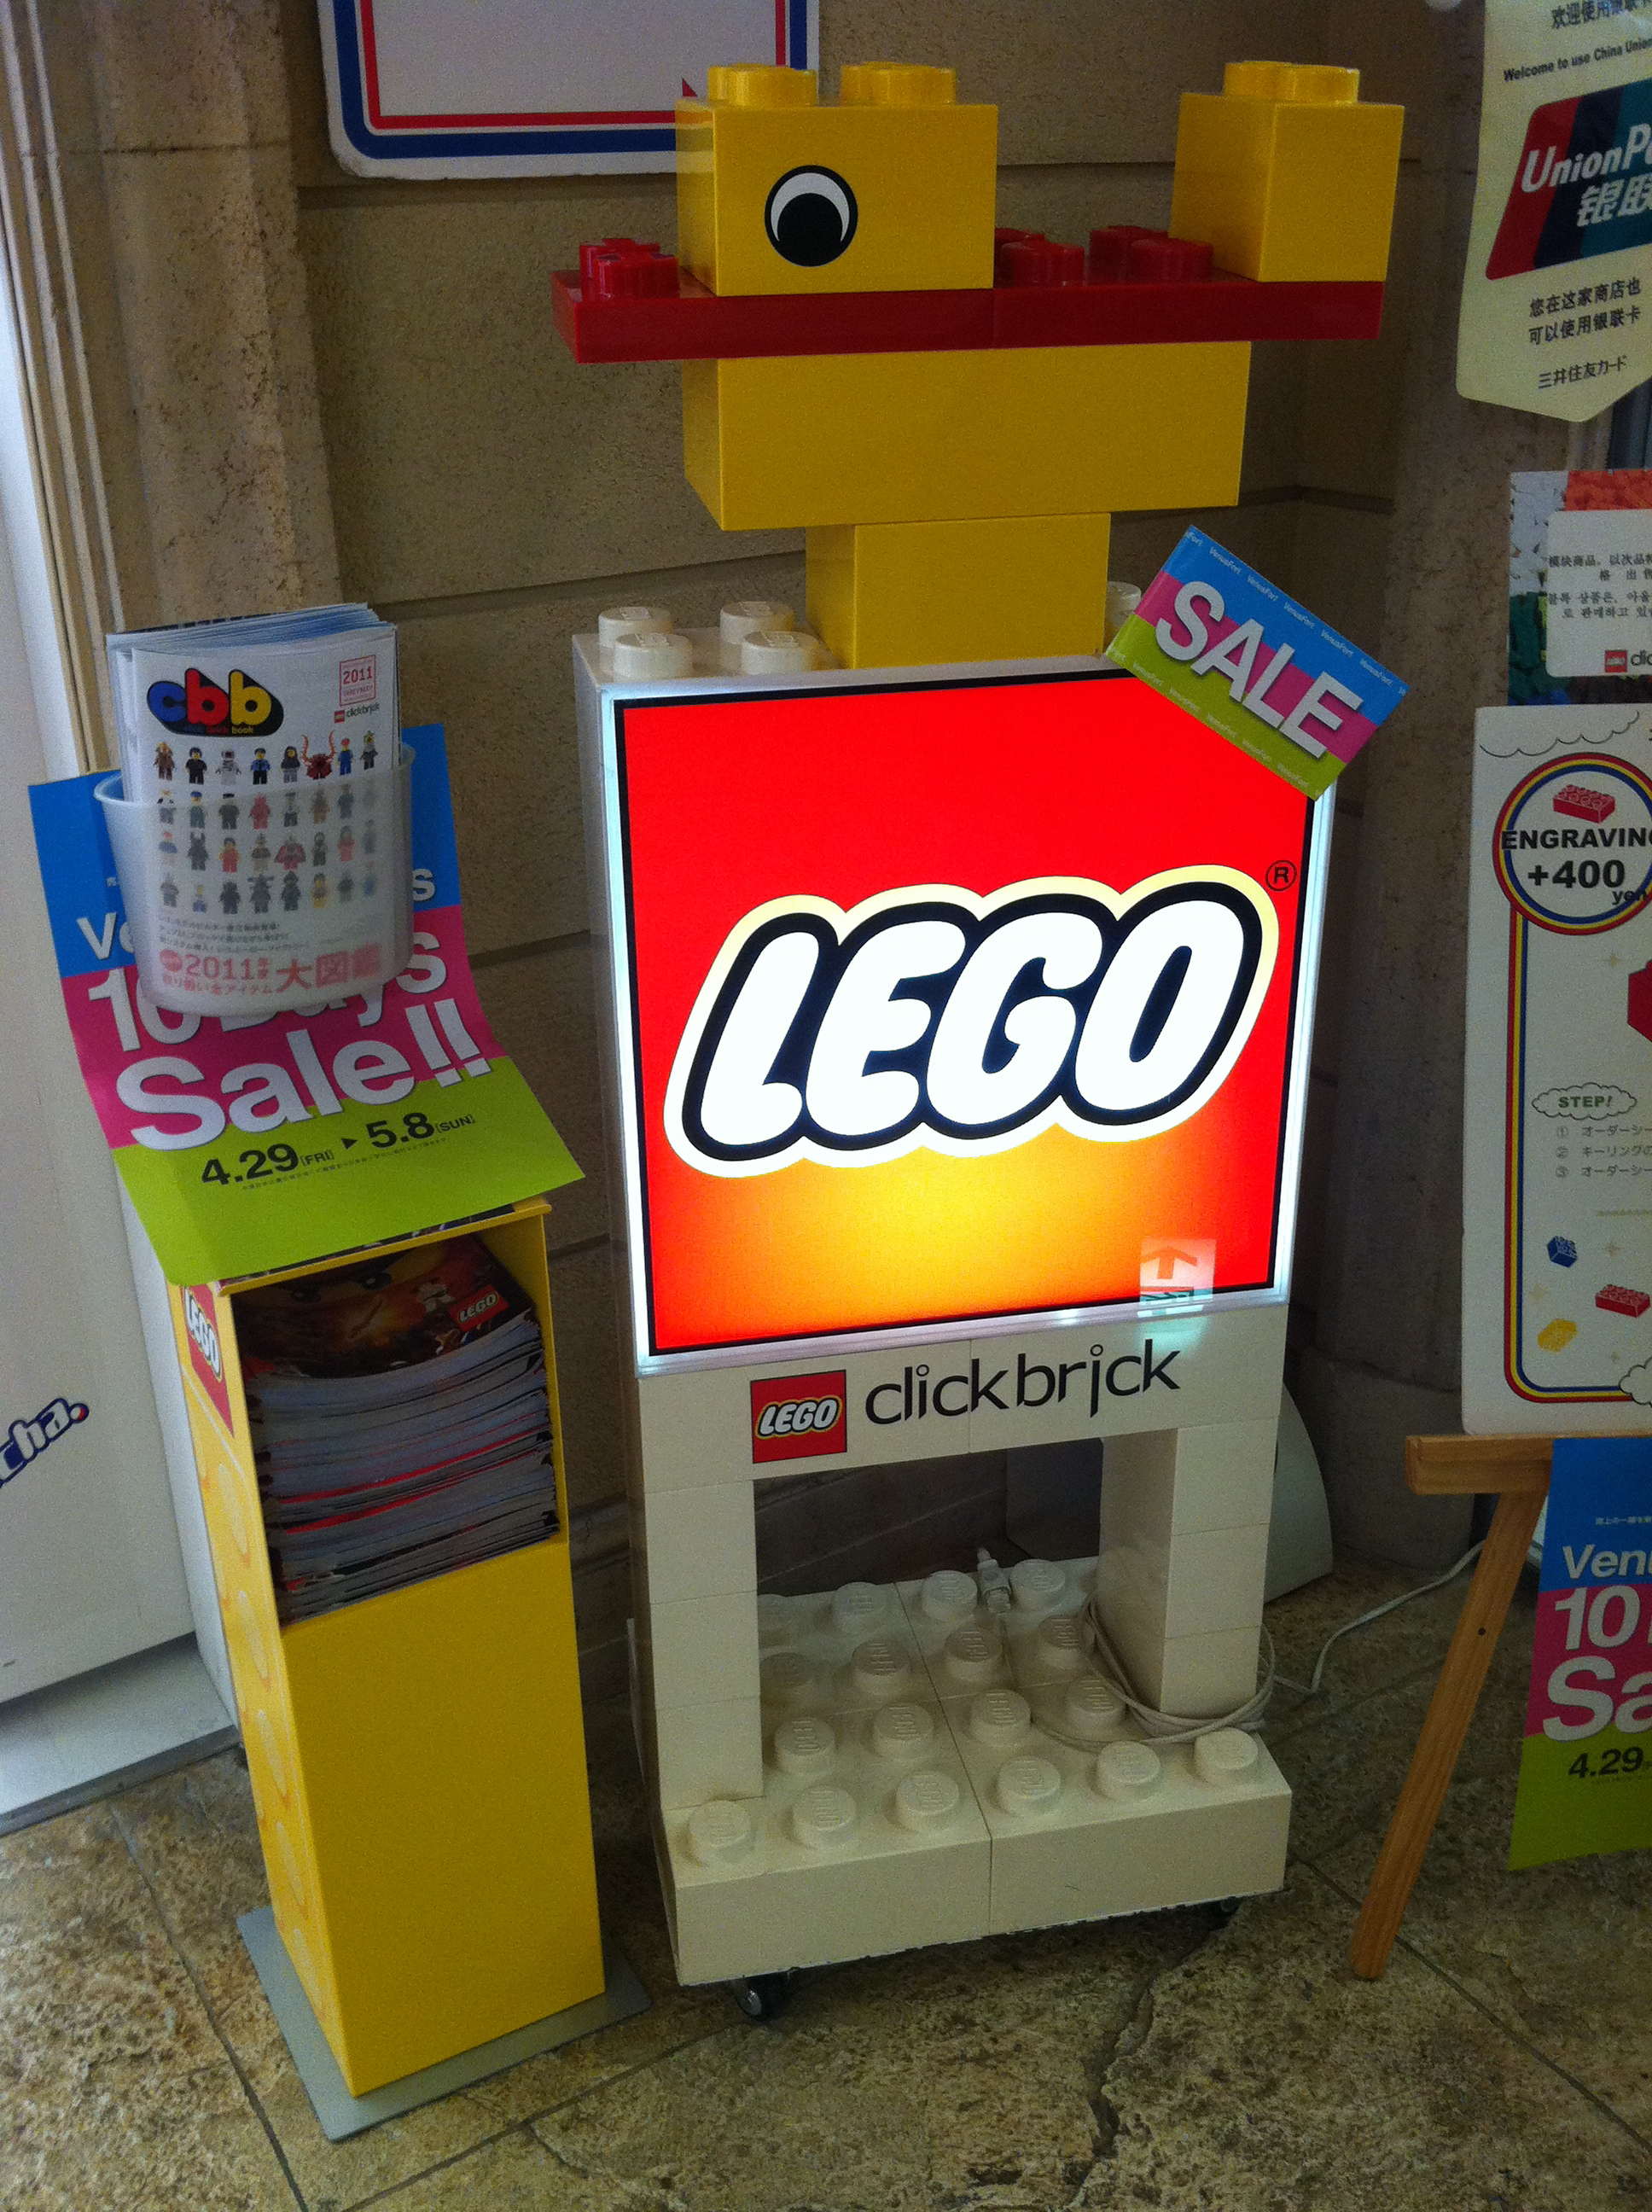 LEGO clickbrick Shop